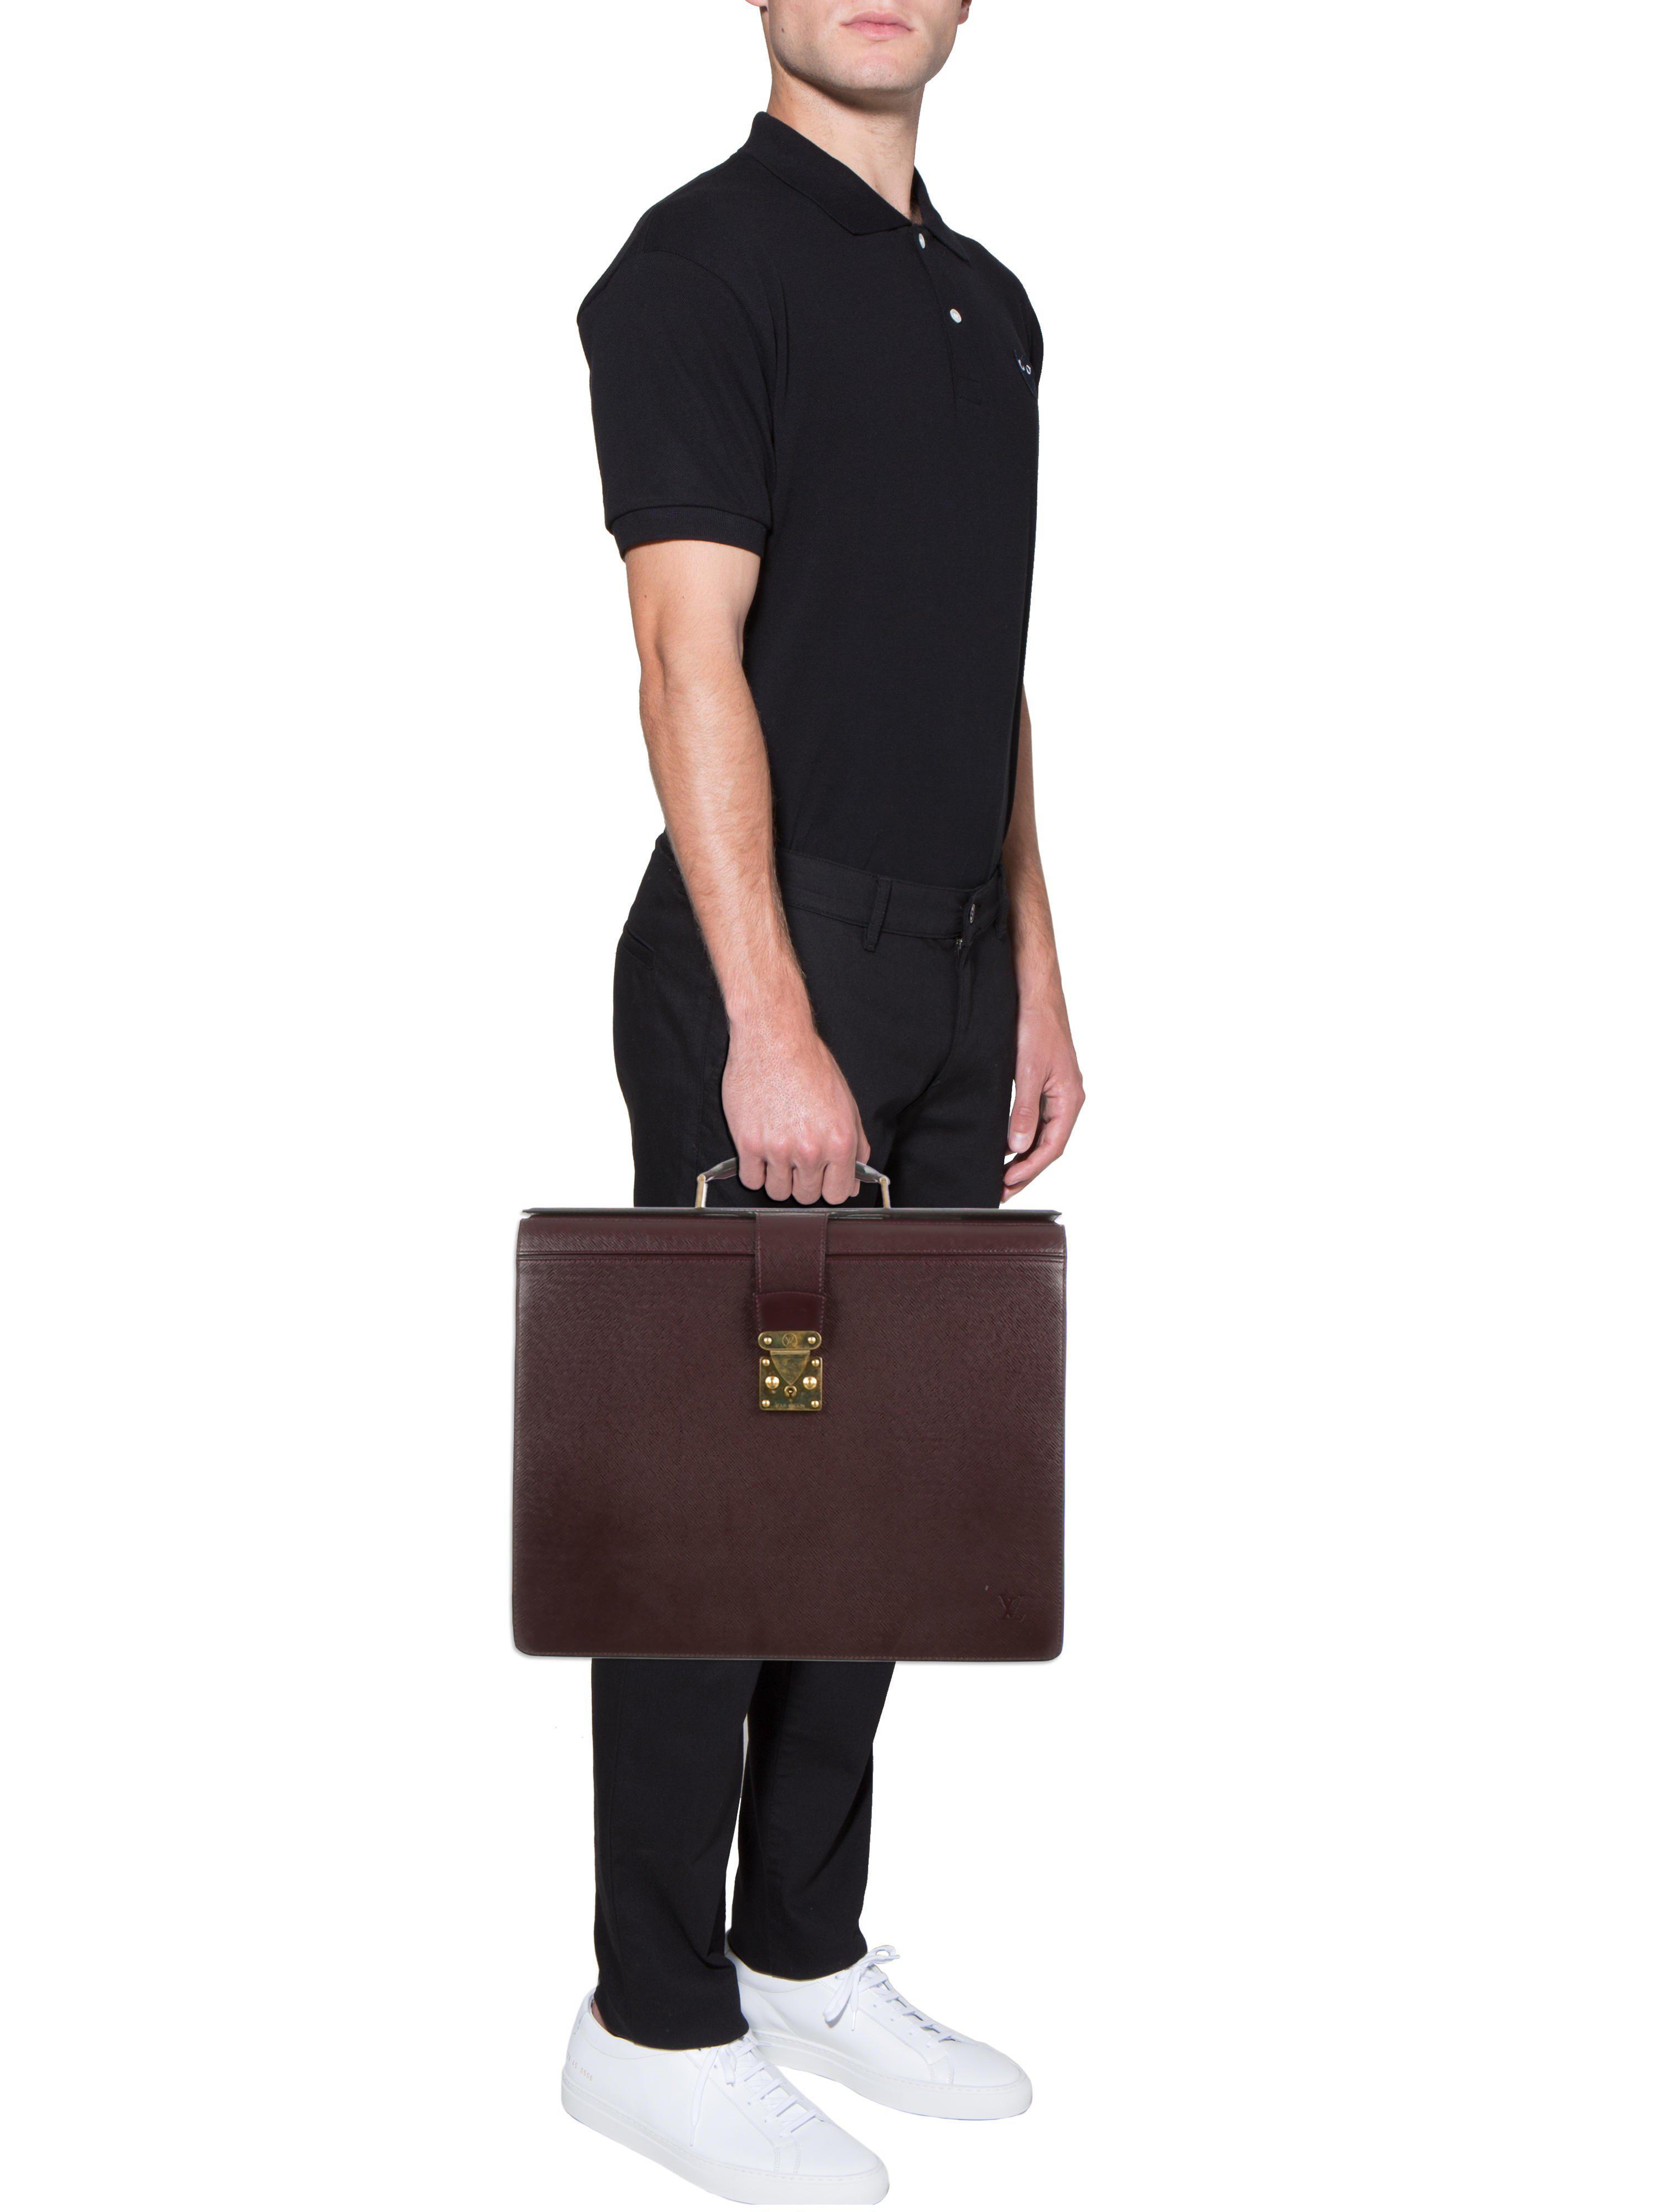 2c896f18cb9d Lyst - Louis Vuitton Taiga Pilot Briefcase Burgundy in Red for Men